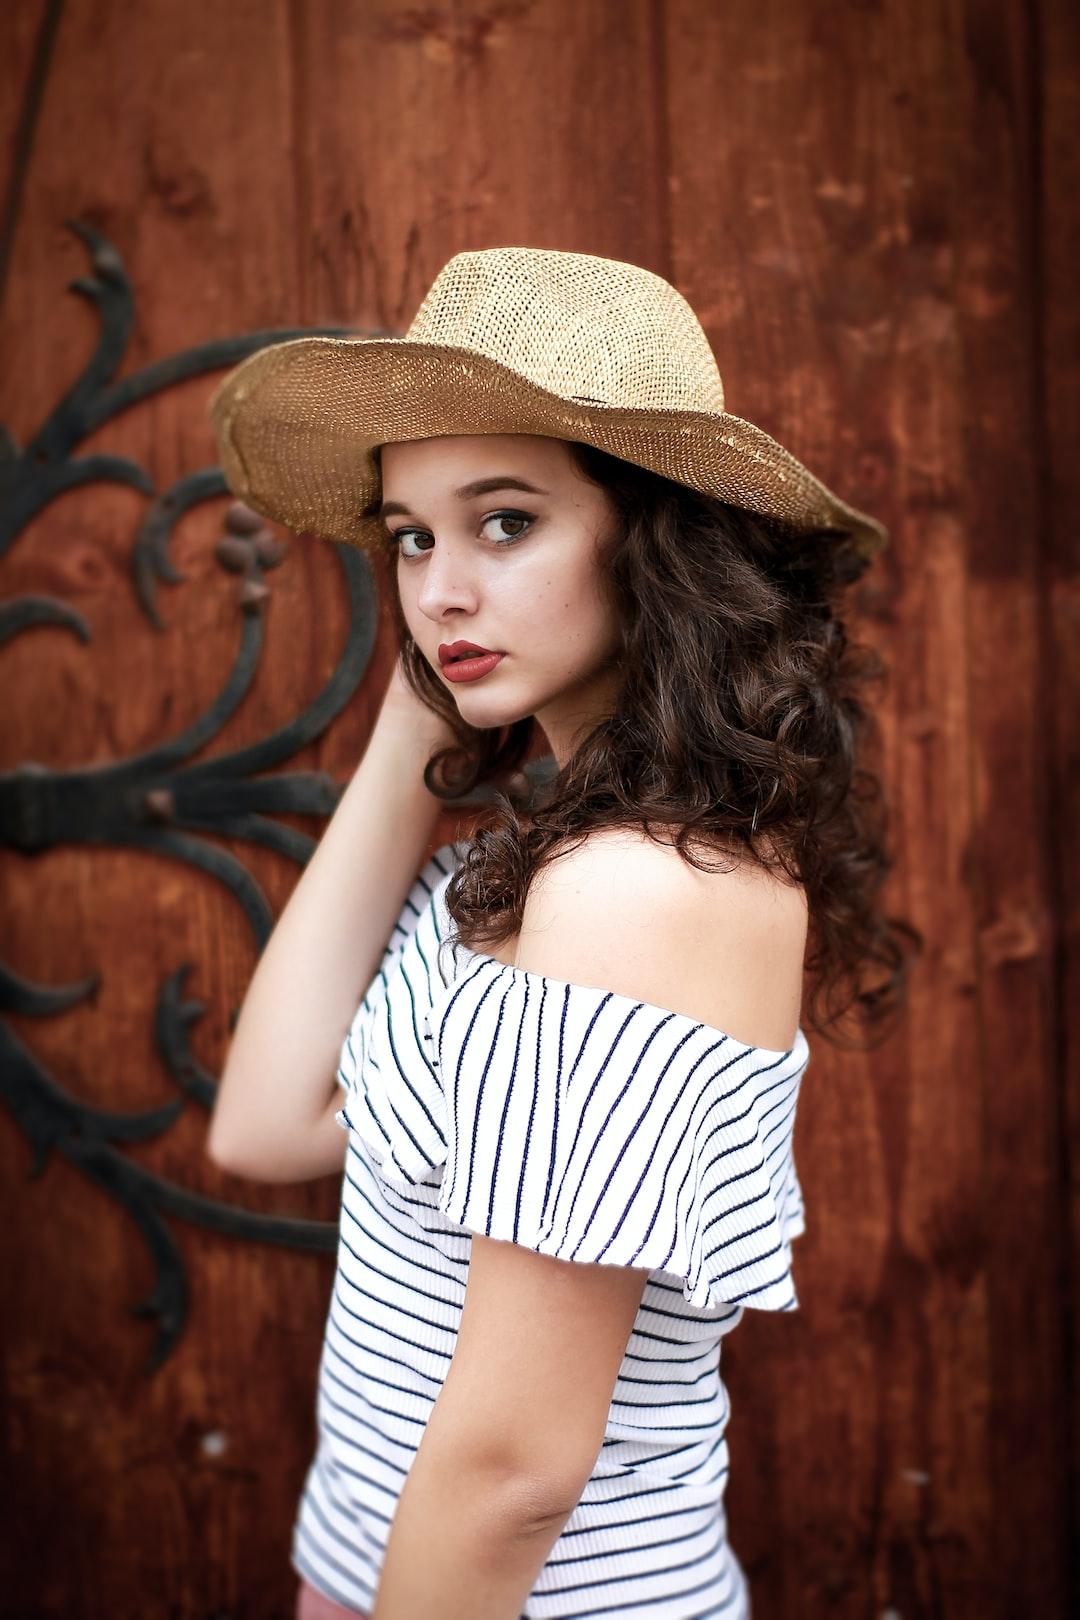 Can teenage girls use white beauty cream?